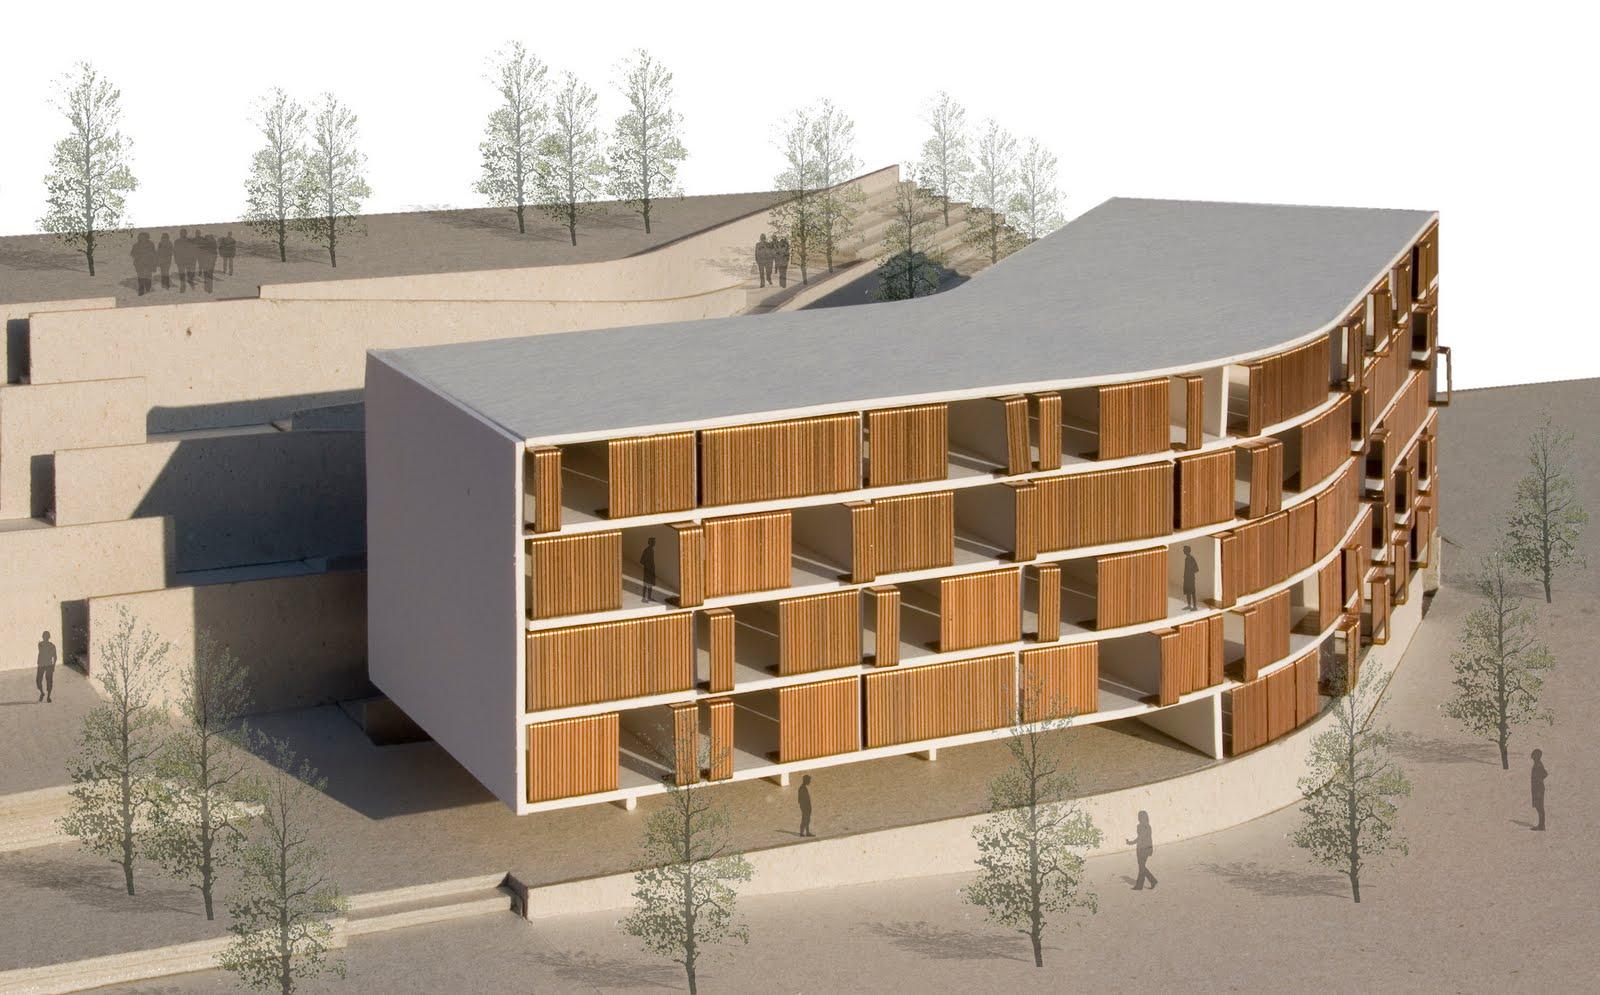 V m arquitectos valencia spain ed 42 viviendas - Patio ingles ...